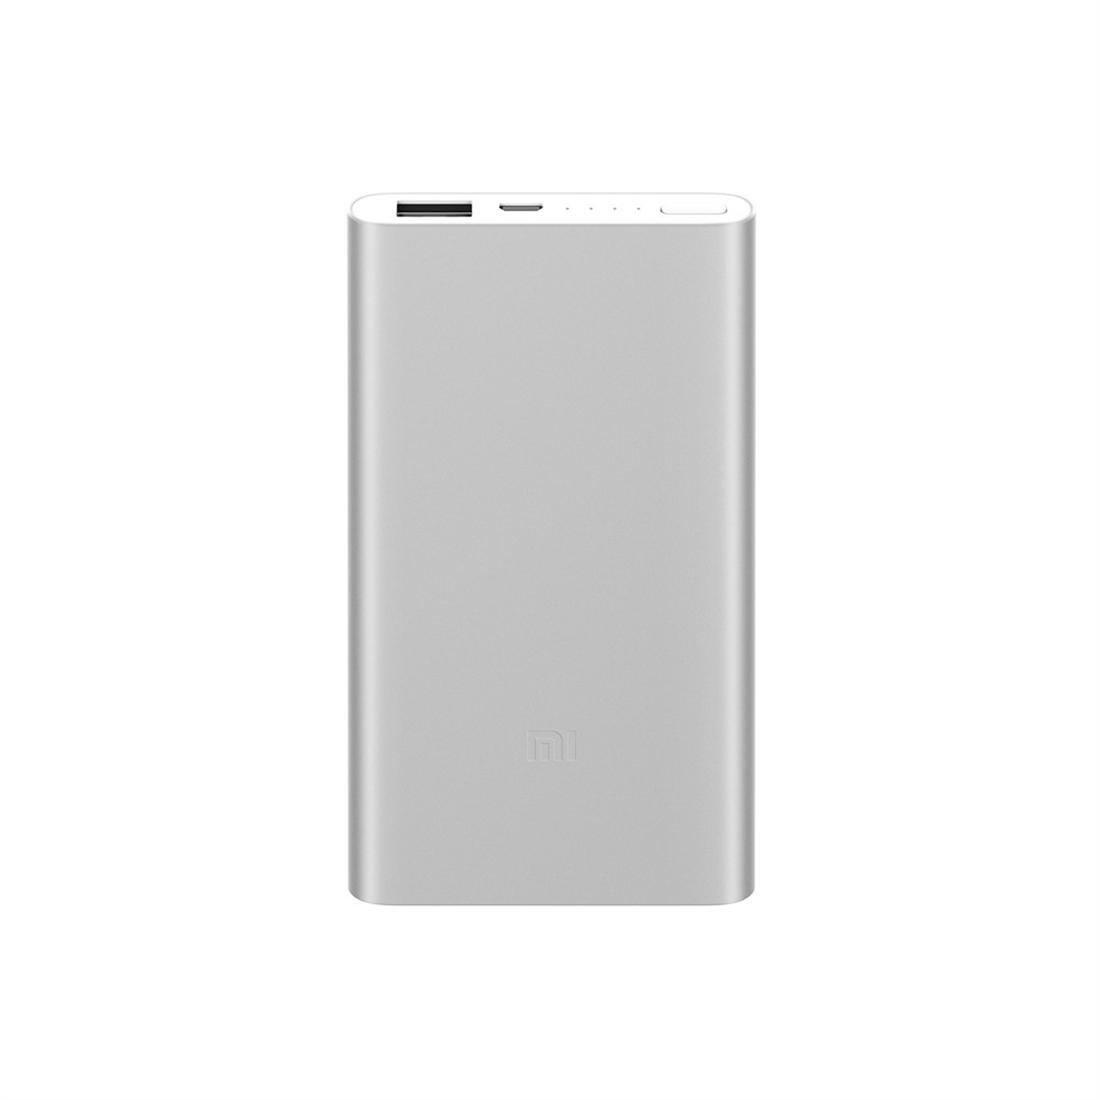 Original Xiaomi Power Bank 2 5000mAh  Fast Charge for iPhone X 8 Plus Samsung Smartphones